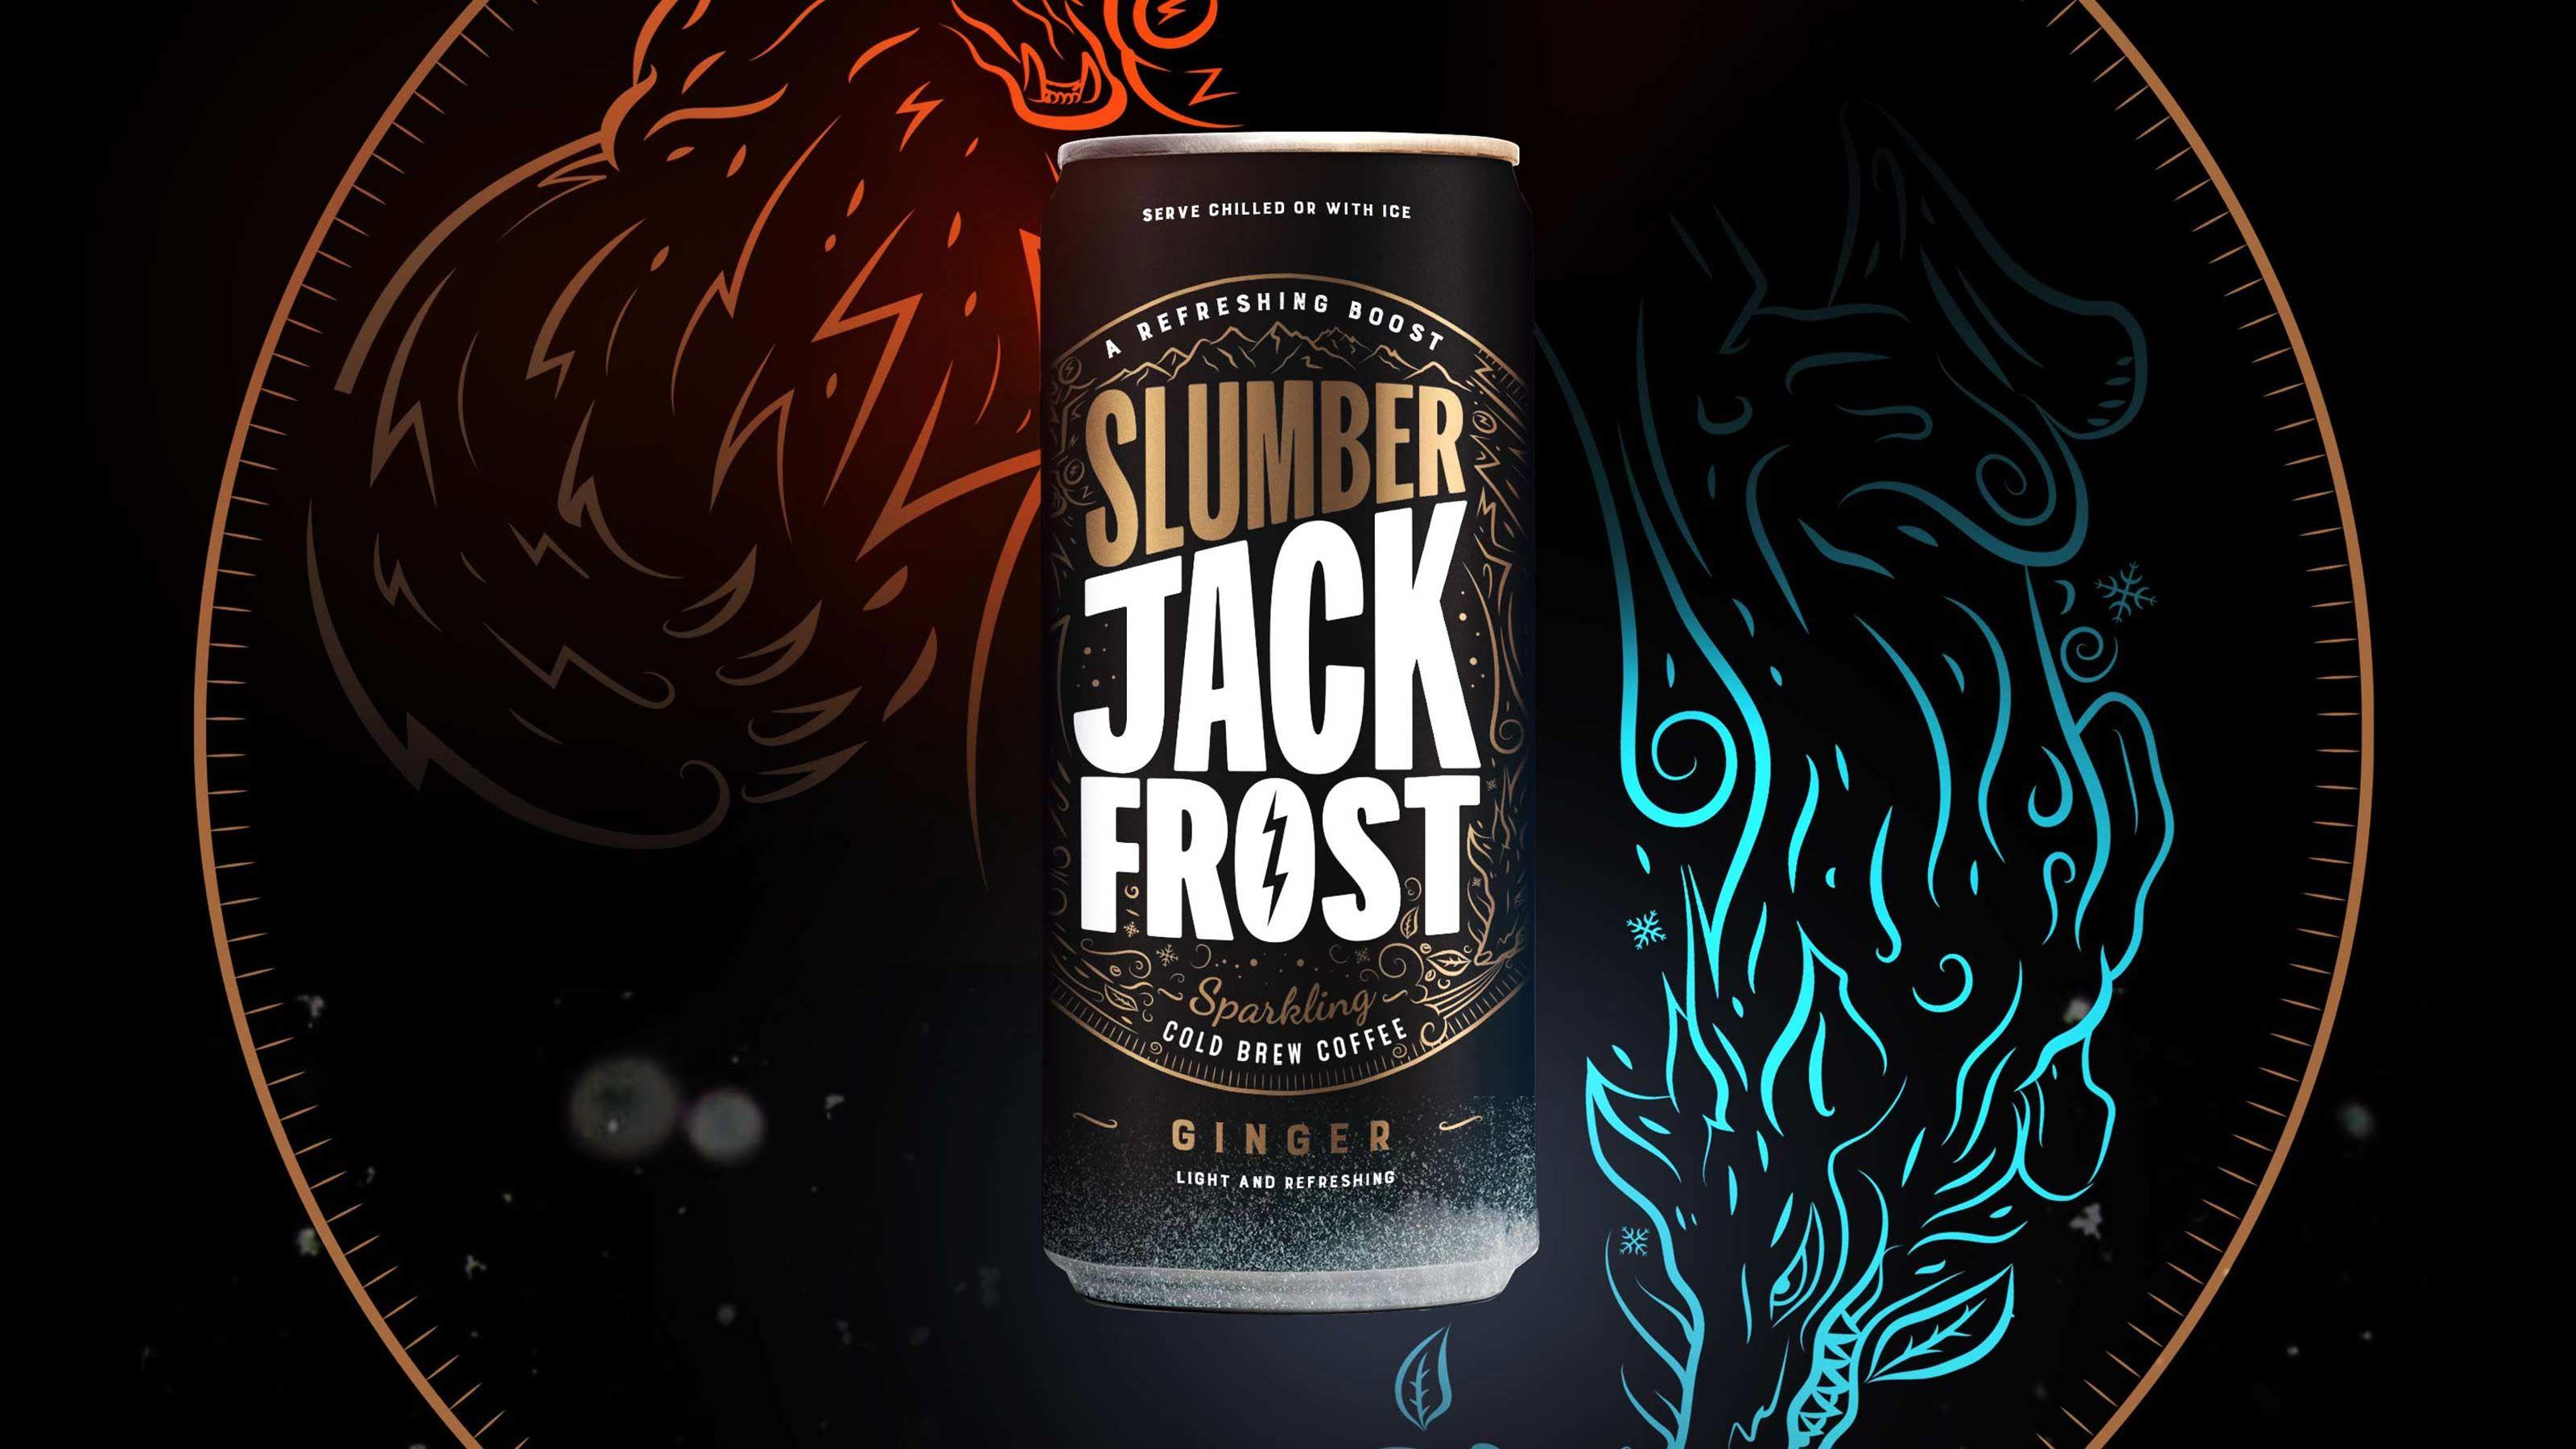 Slumberjack cold brew